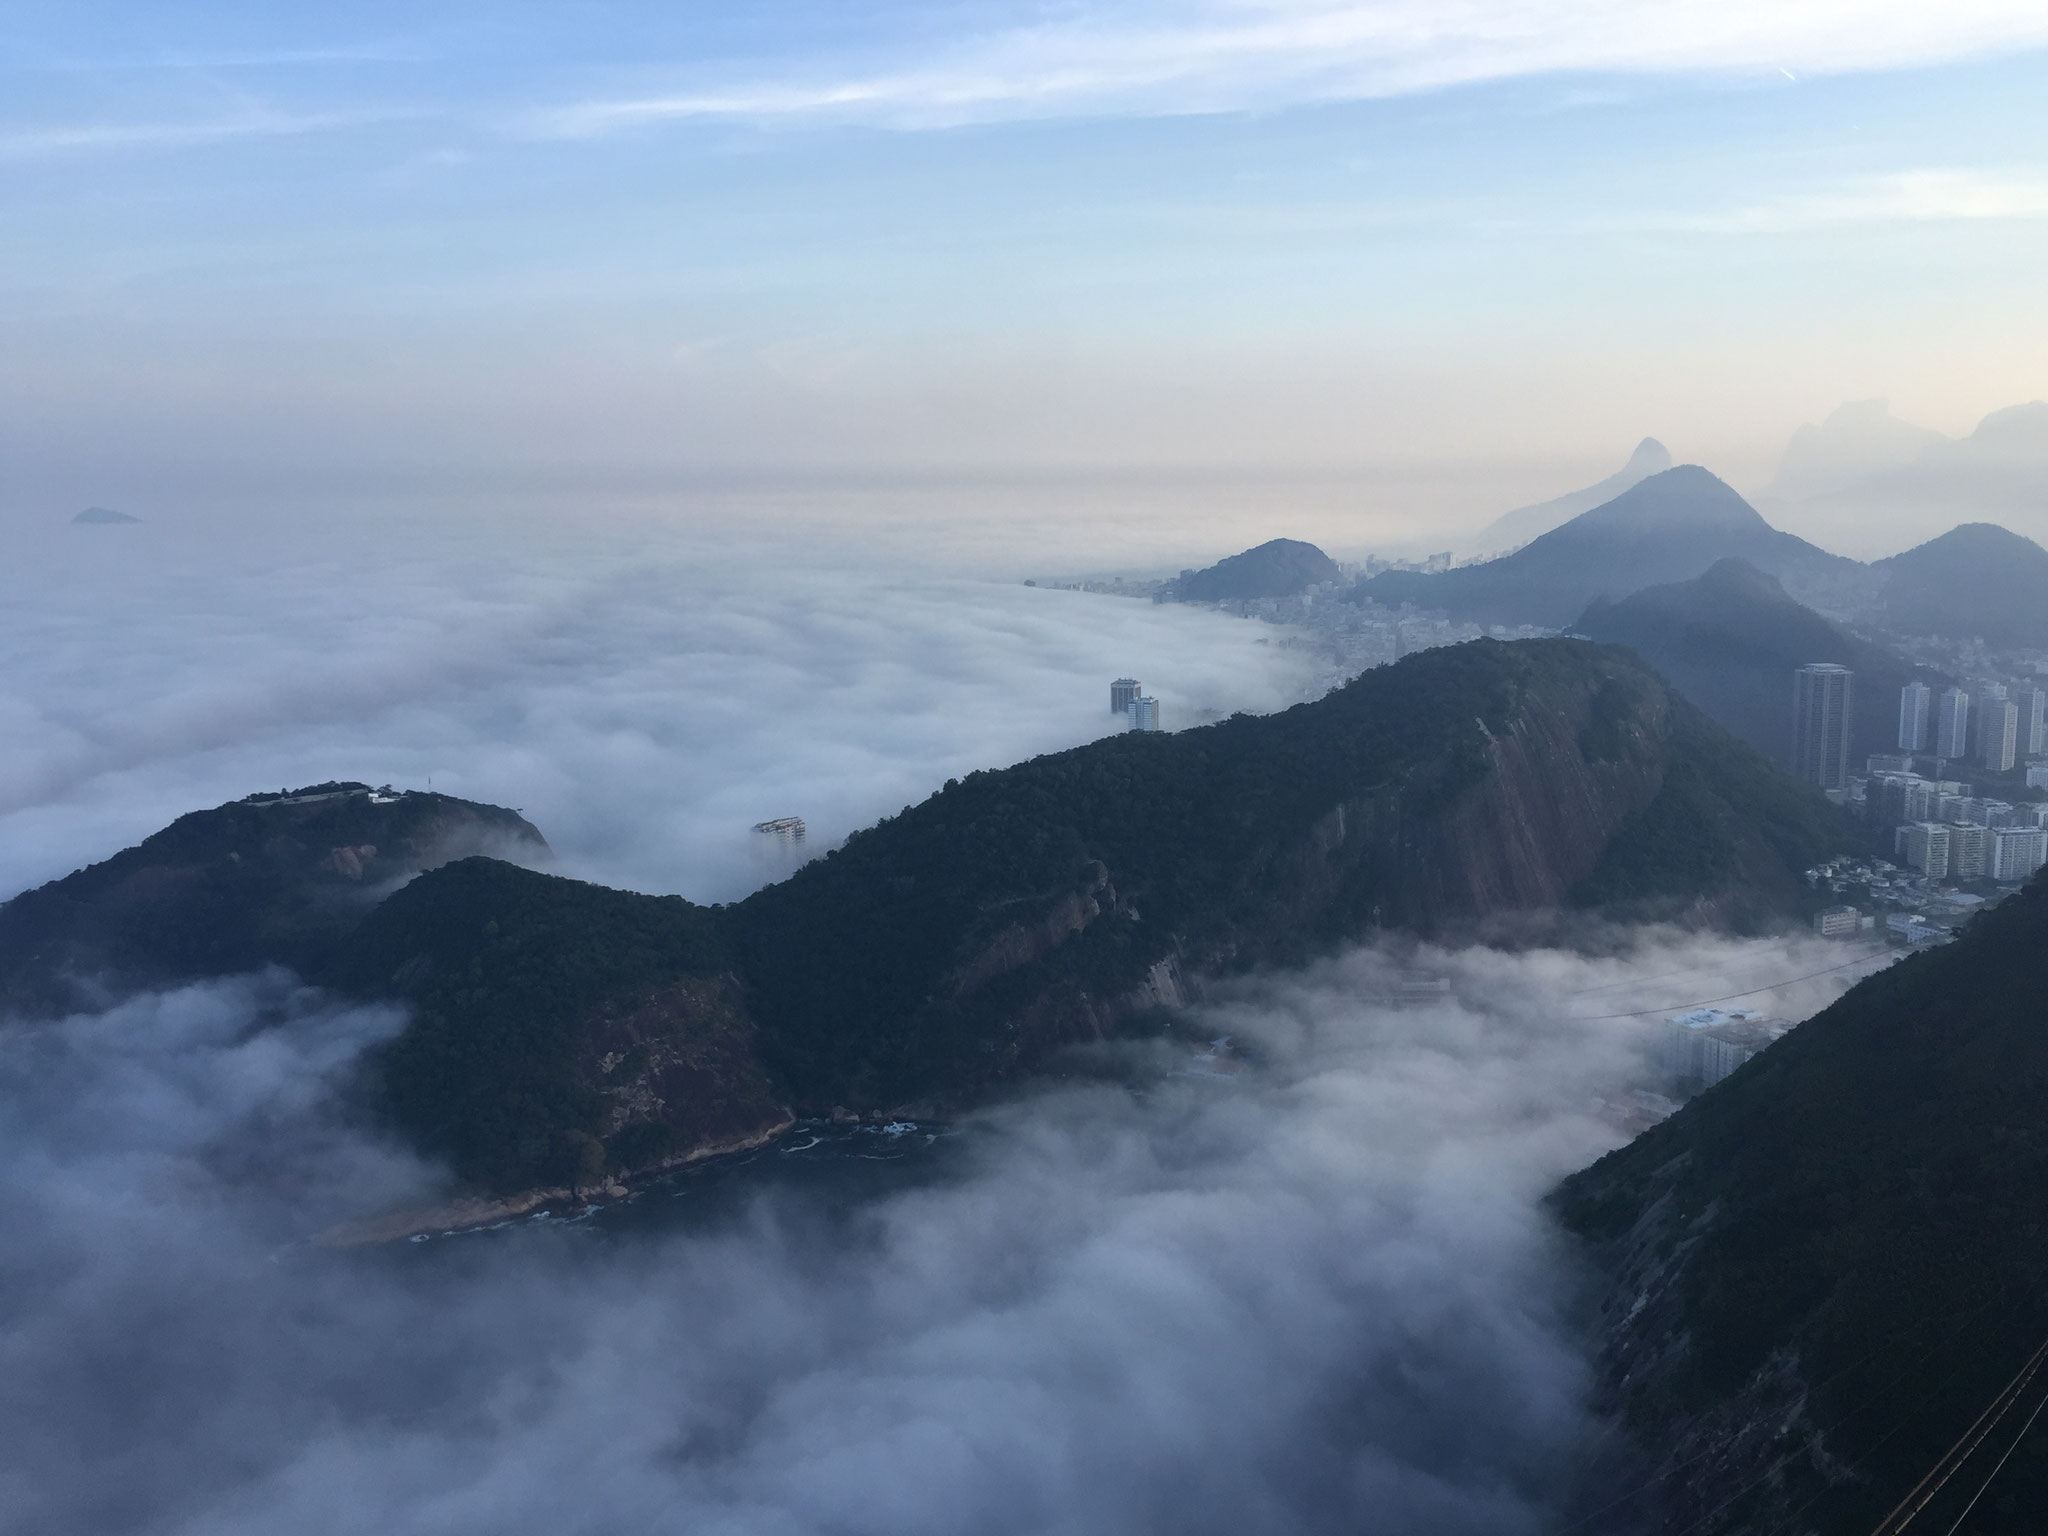 Rio im Nebel